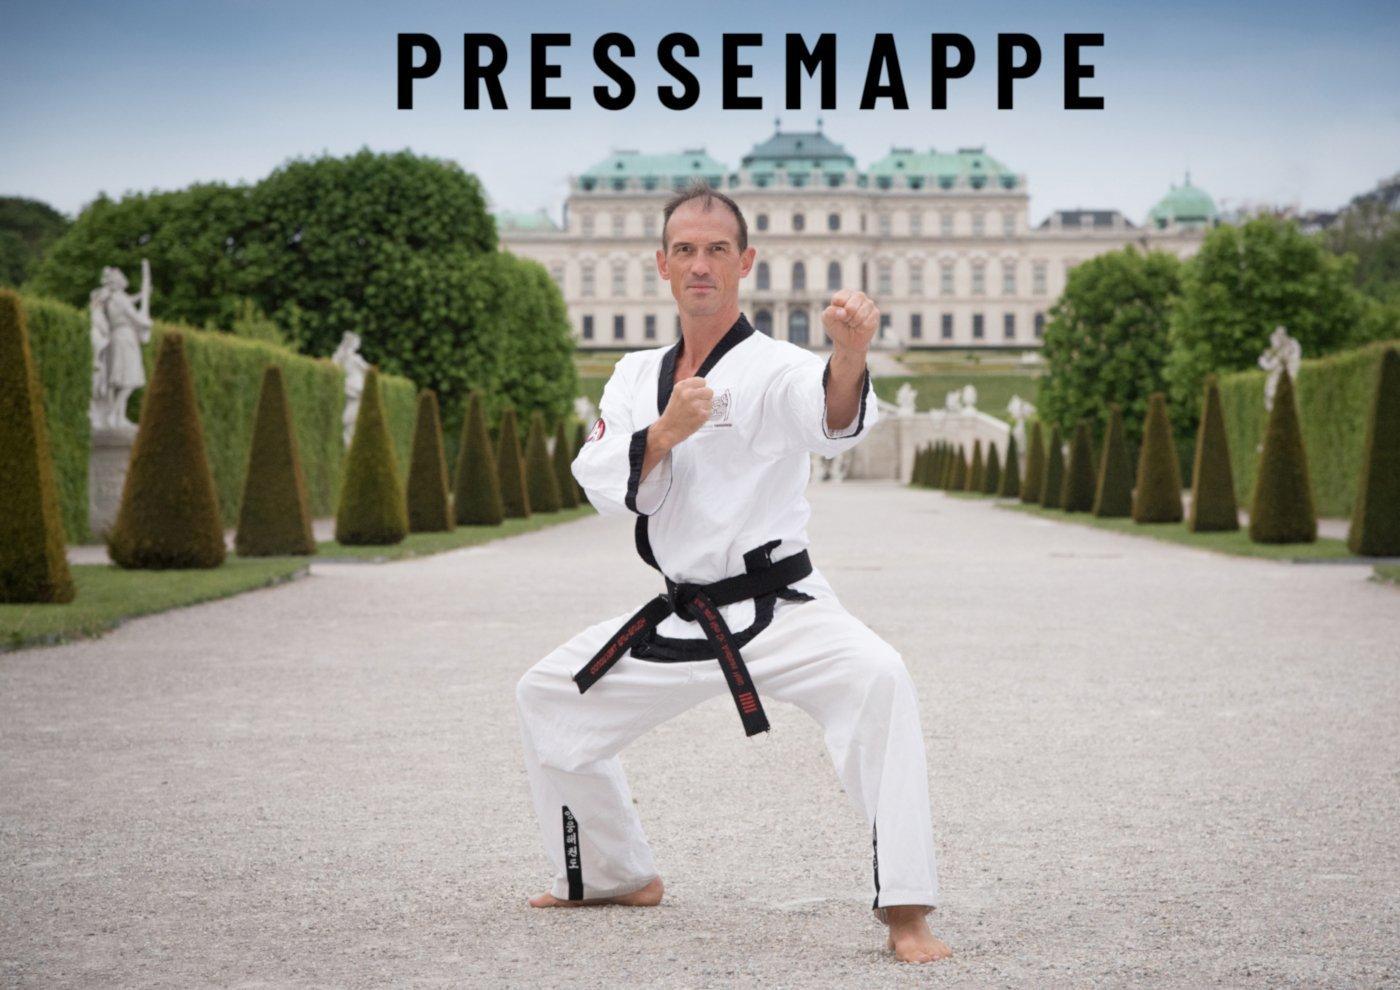 Pressemappe (Stand: 2019)